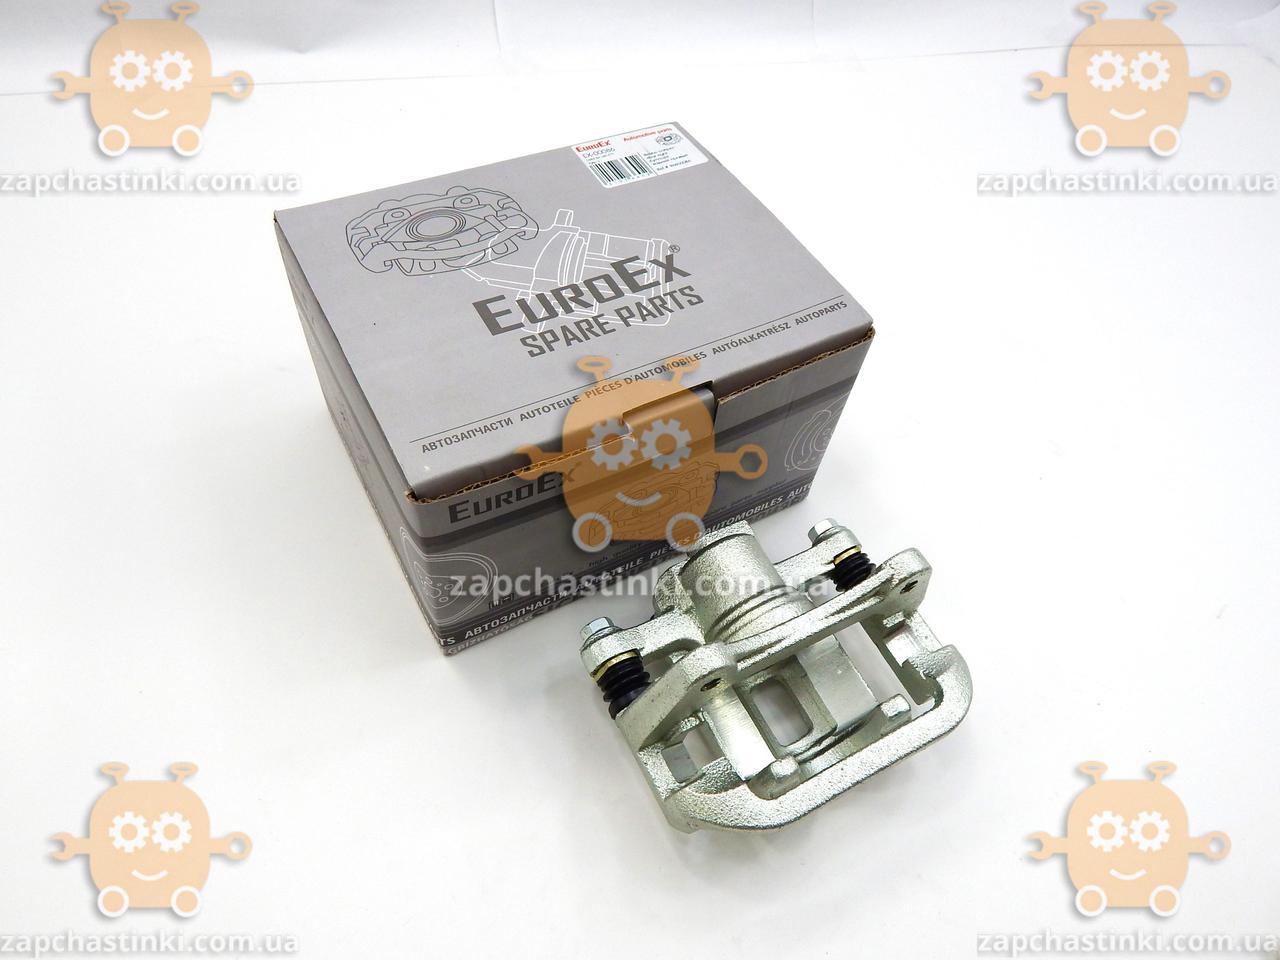 Суппорт CHEVROLET LACETTI задний правый (пр-во EuroEx Венгрия) EE 107660